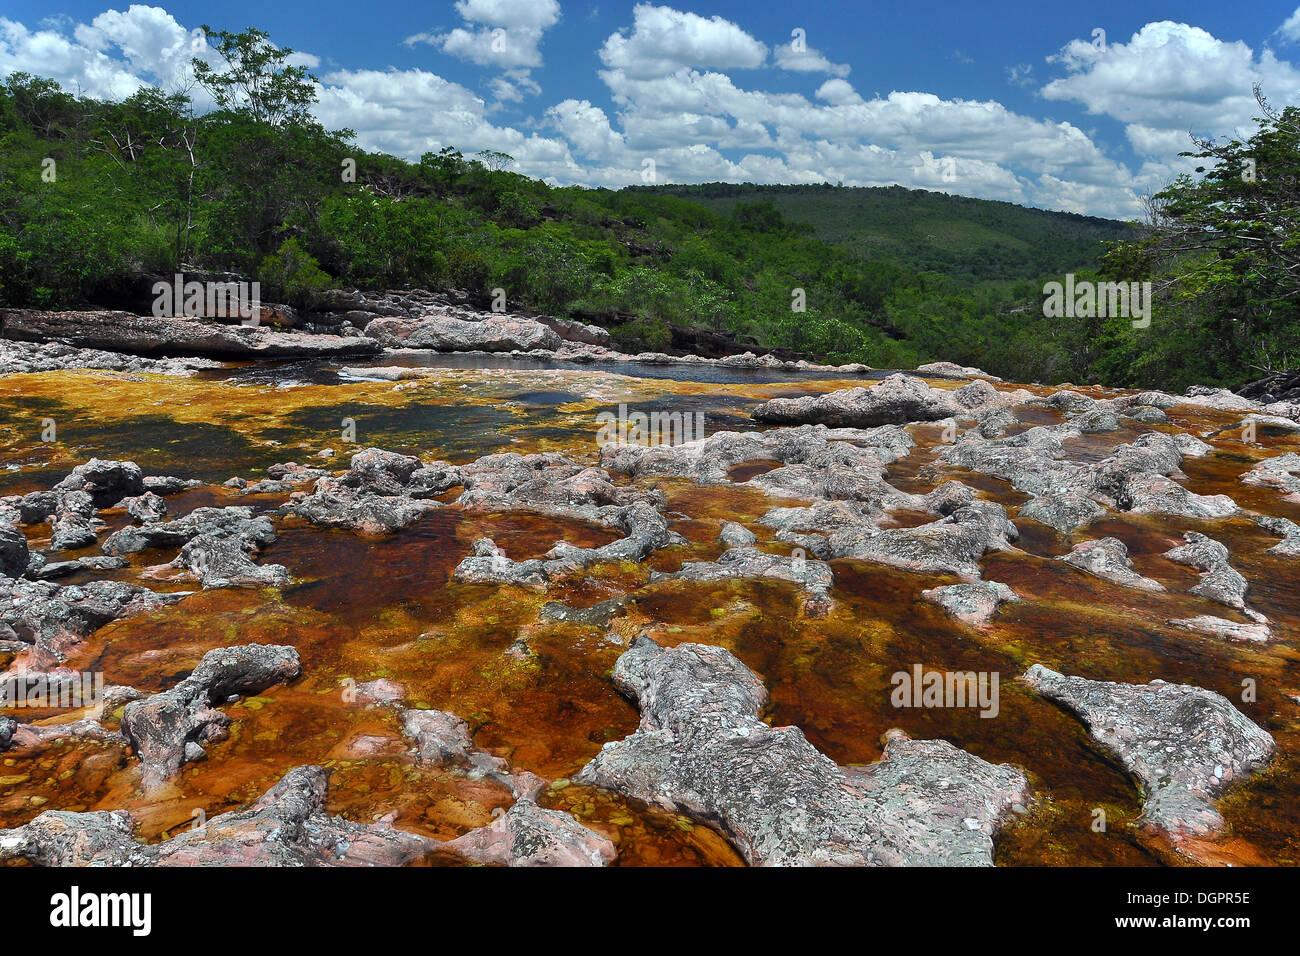 Blackwater river near Lencois, Chapada Diamantina, Bahia, Brazil, South America - Stock Image